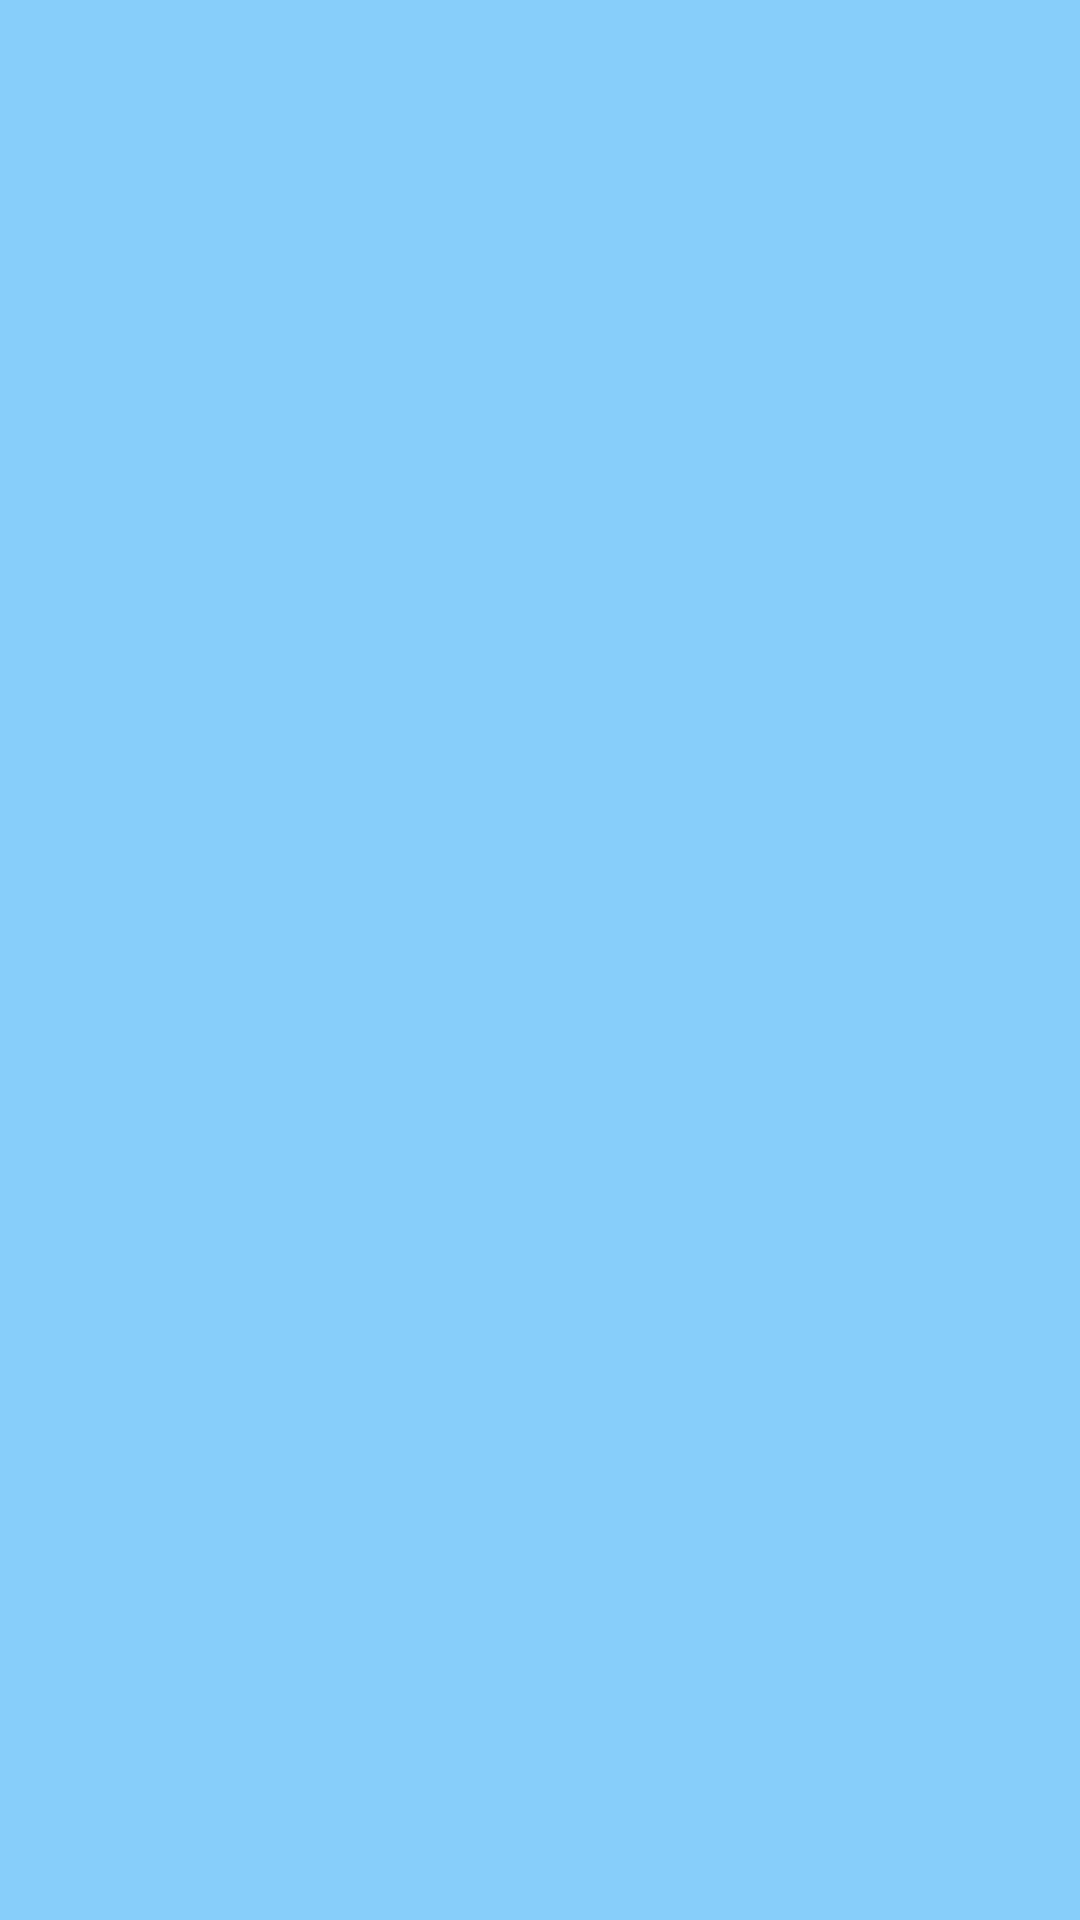 1080x1920 Light Sky Blue Solid Color Background